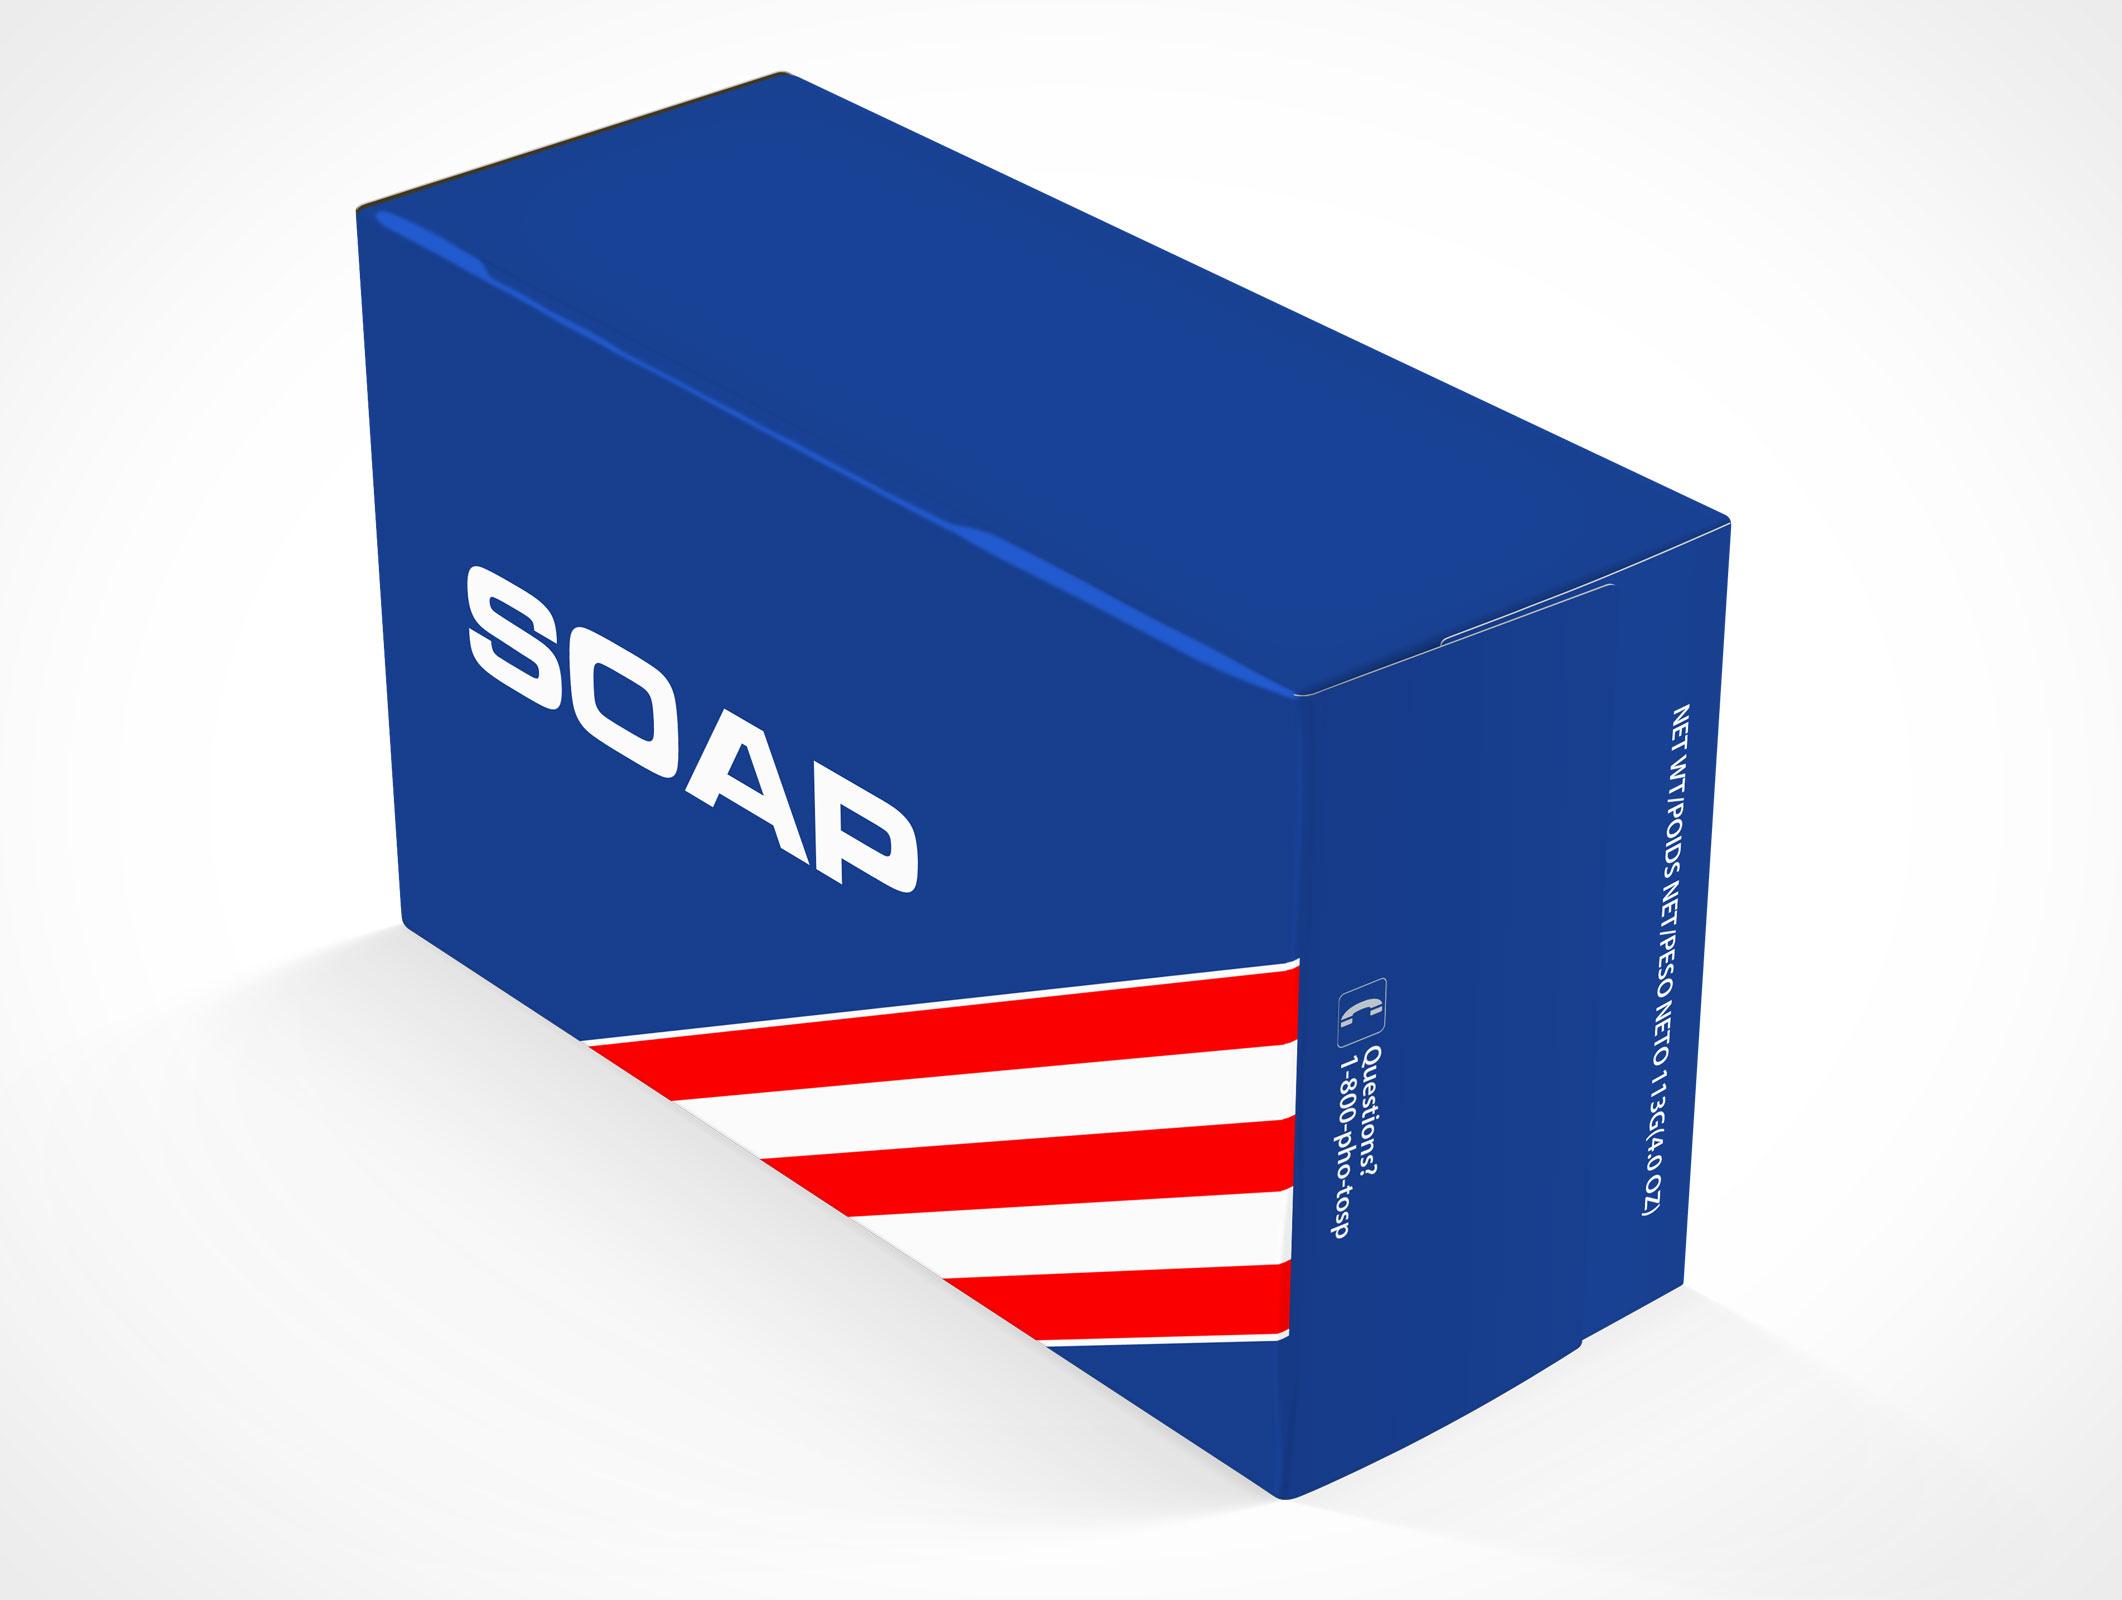 SOAPBOX005r4